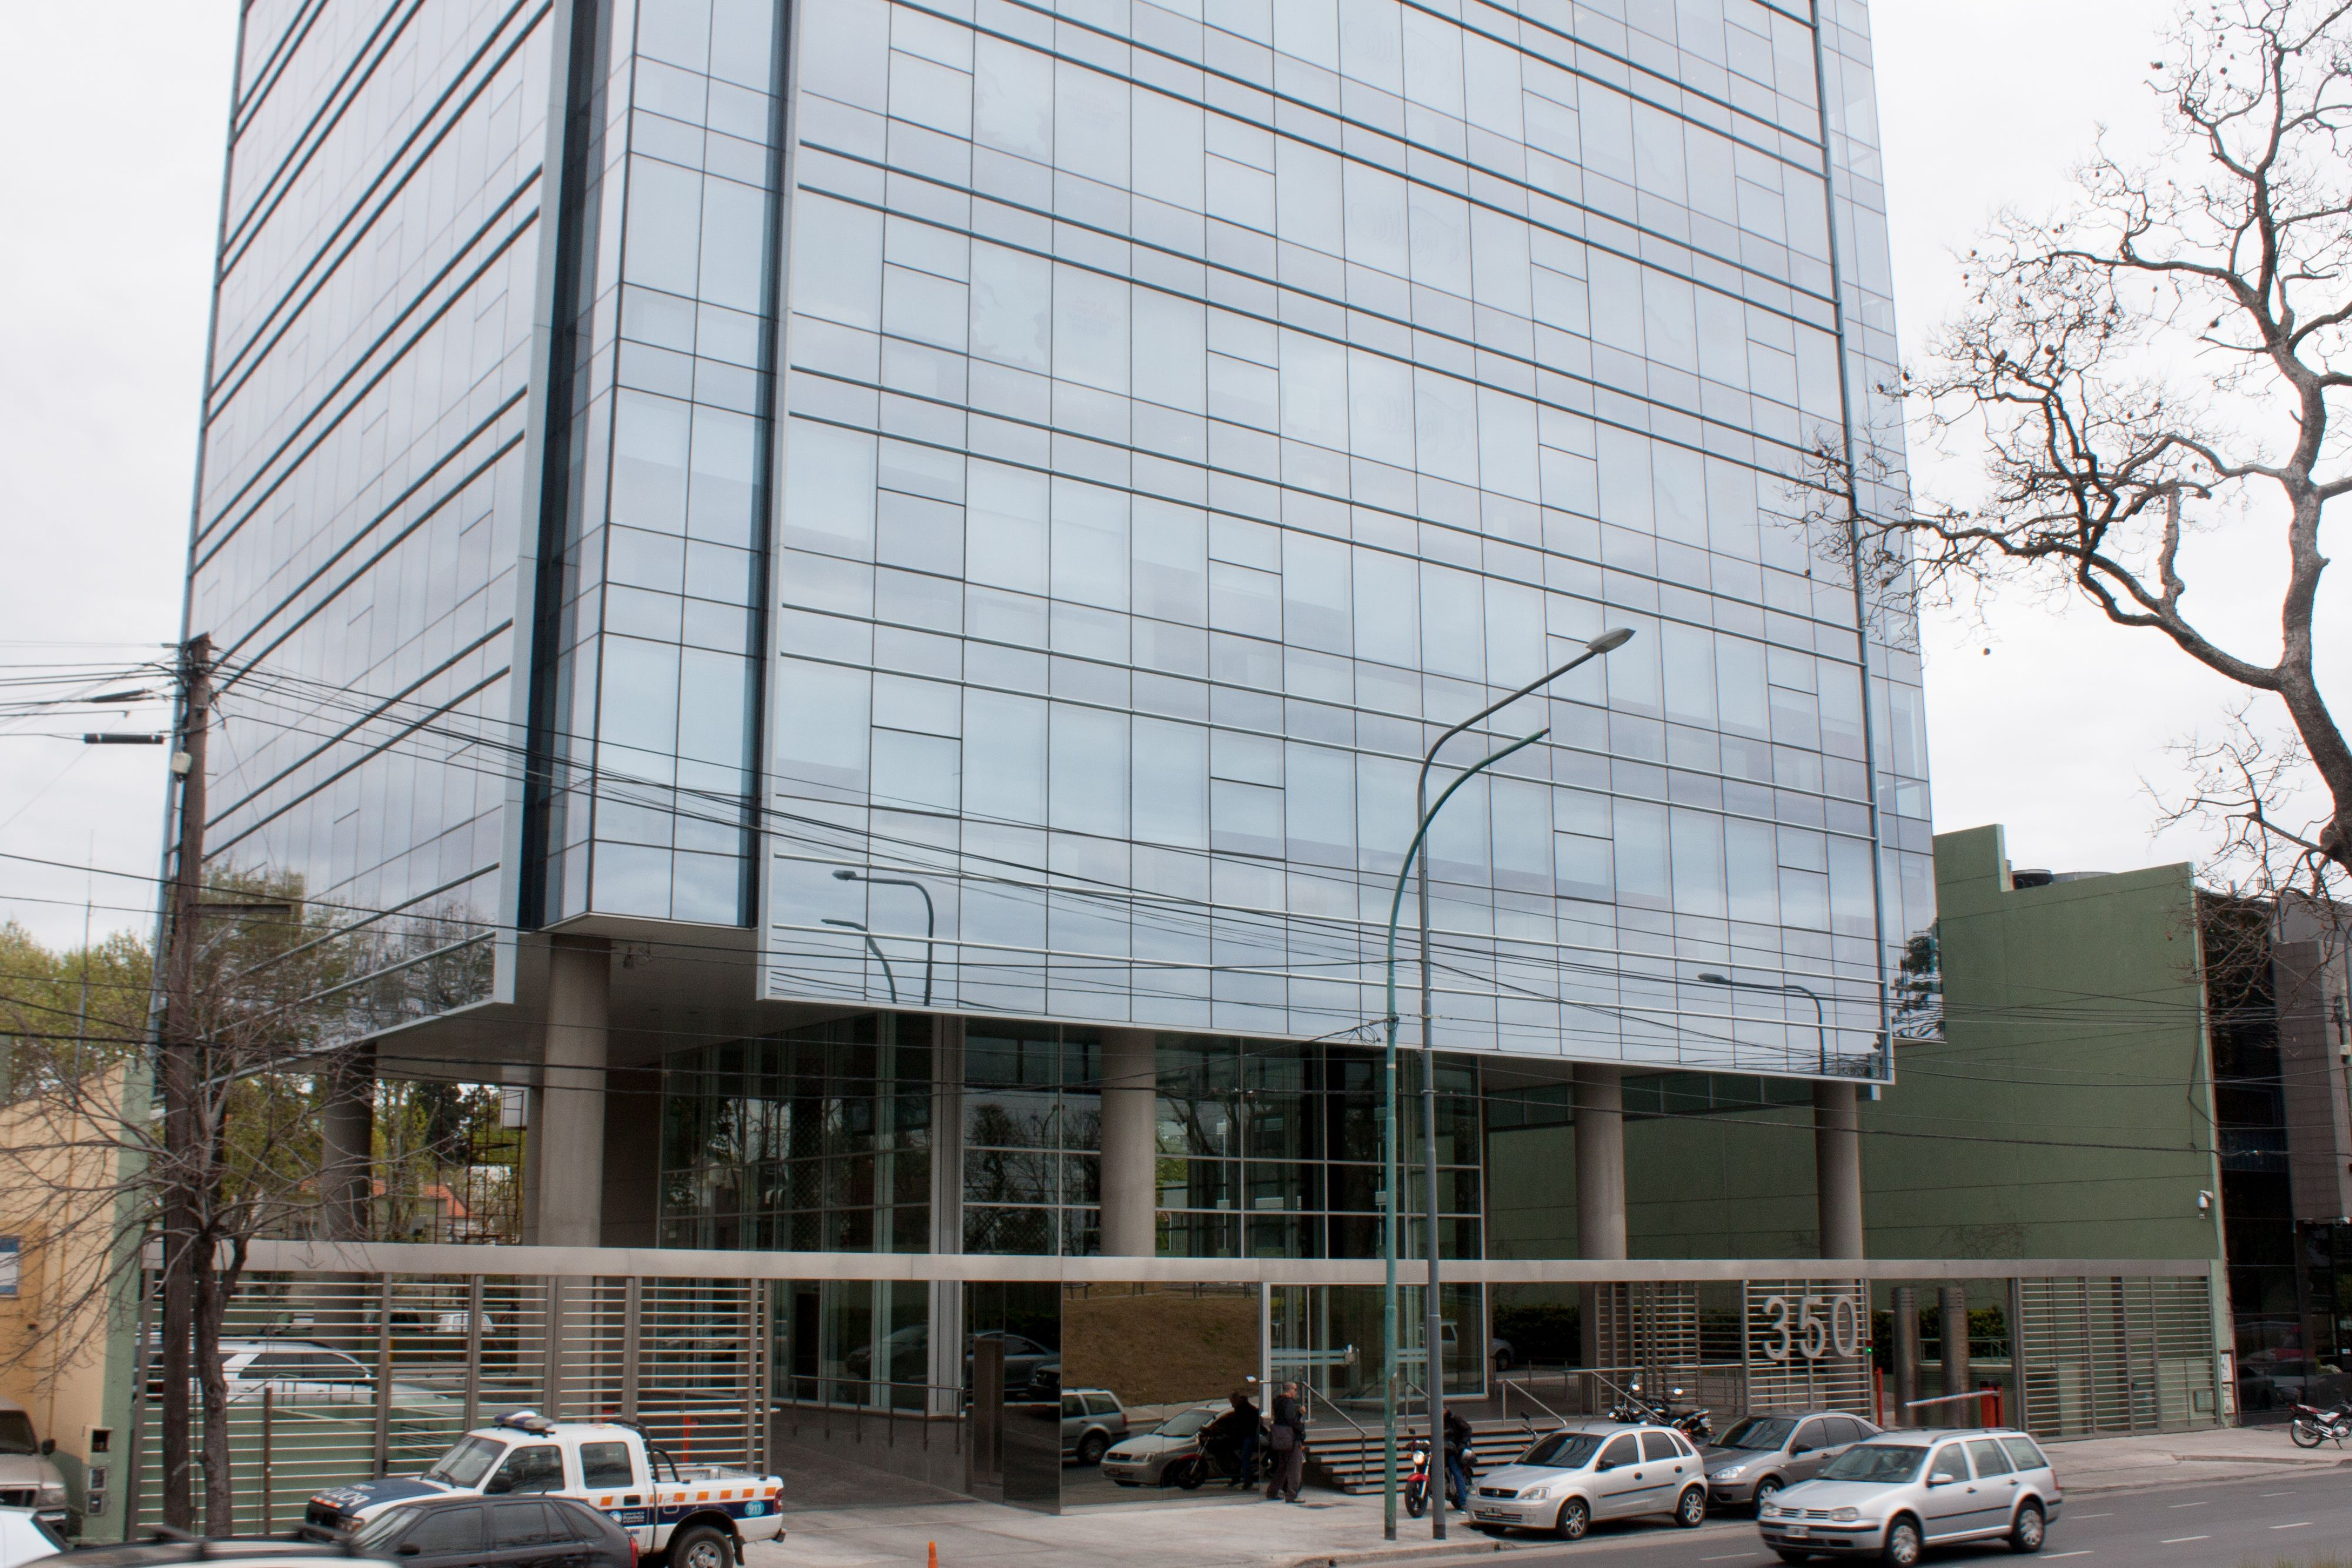 Edificio libertador 350 buenos aires argentina el for Carpinterias de aluminio en argentina